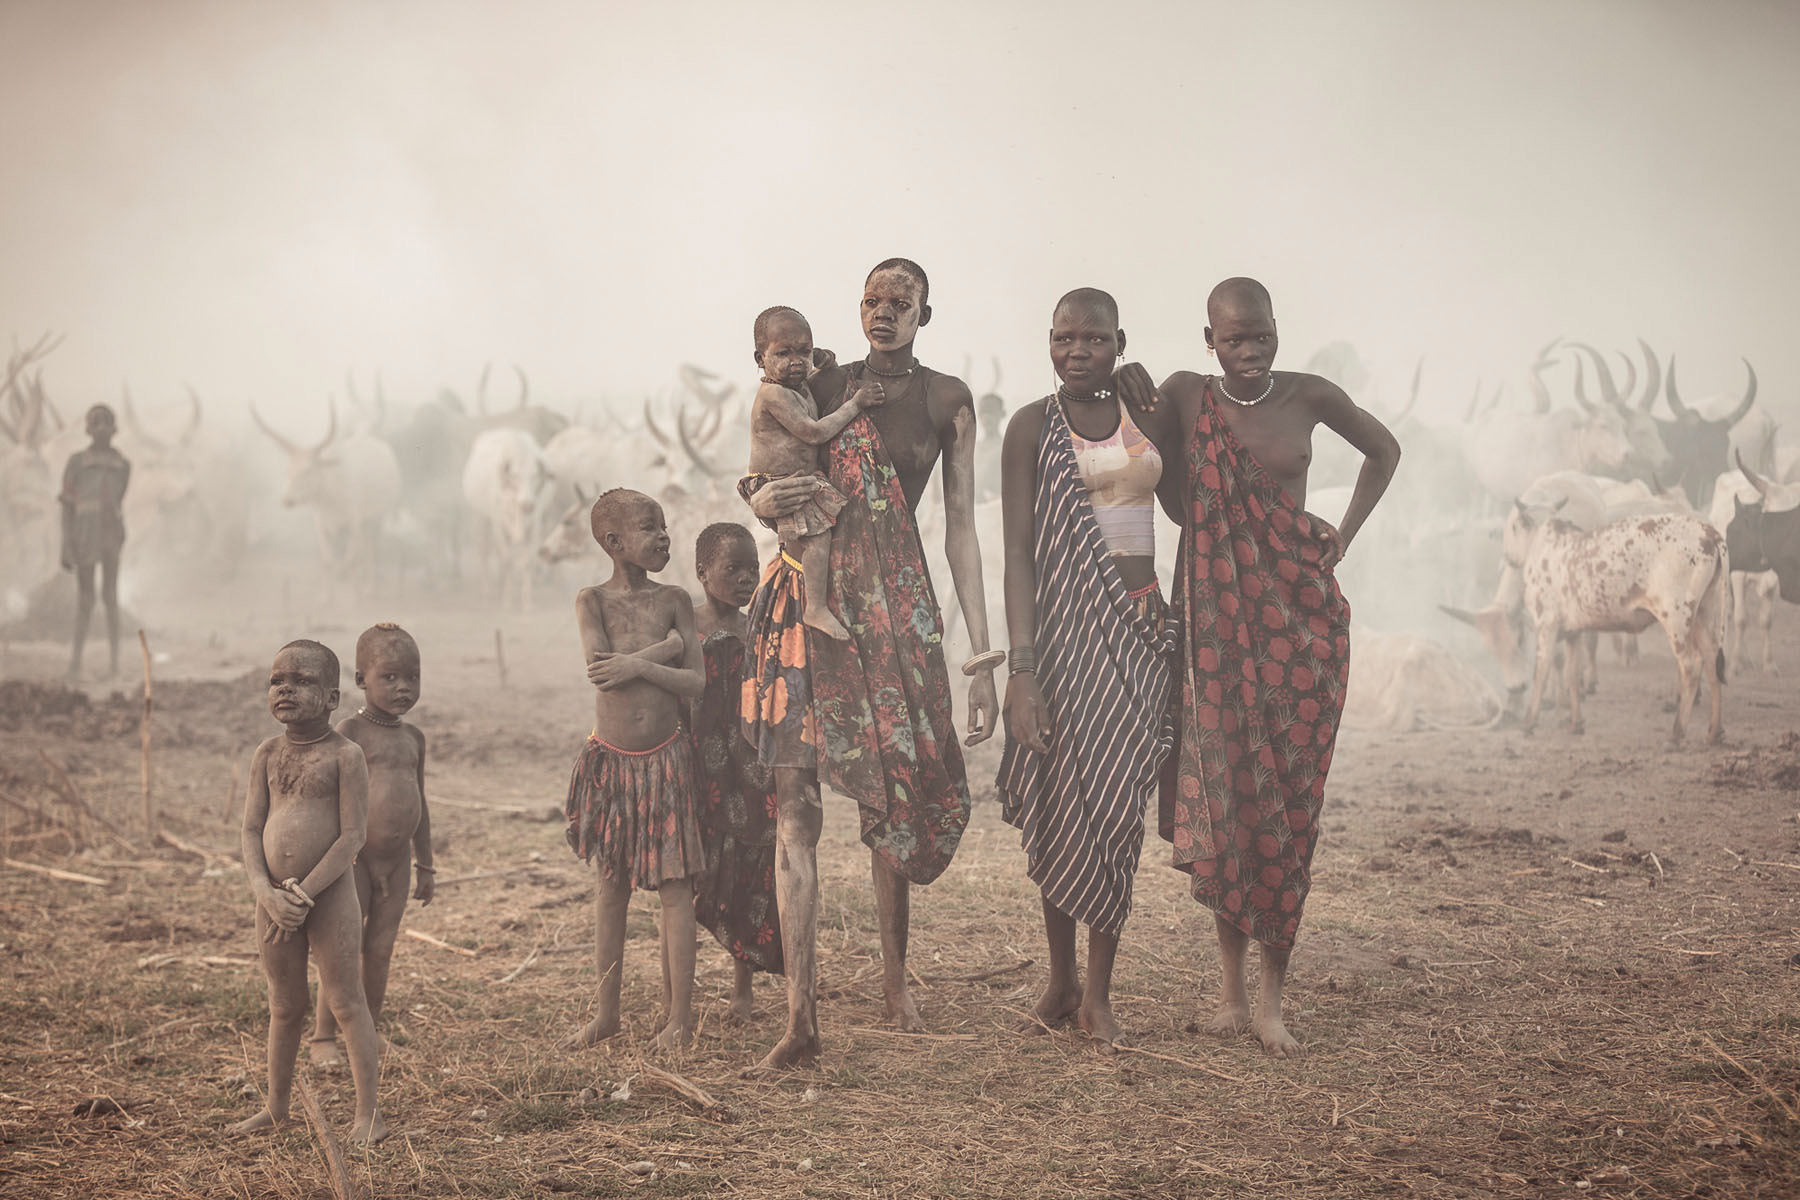 Mundari woman and children at sunrise © Joe Buergi